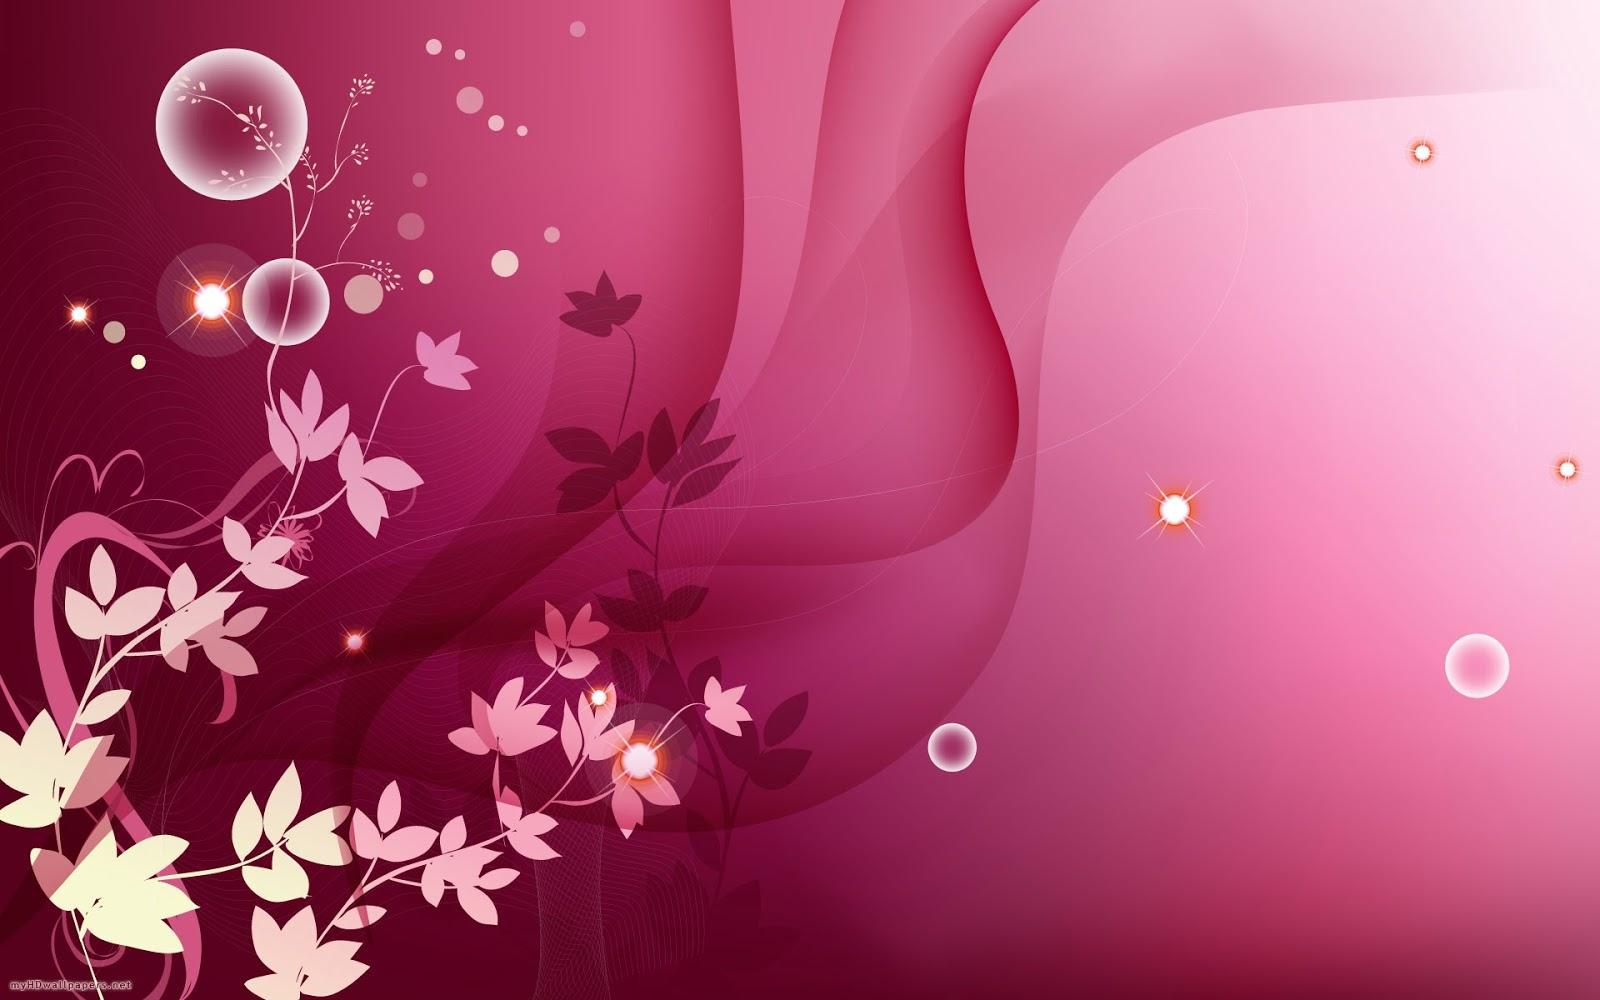 Pink Background HD:Computer Wallpaper | Free Wallpaper Downloads